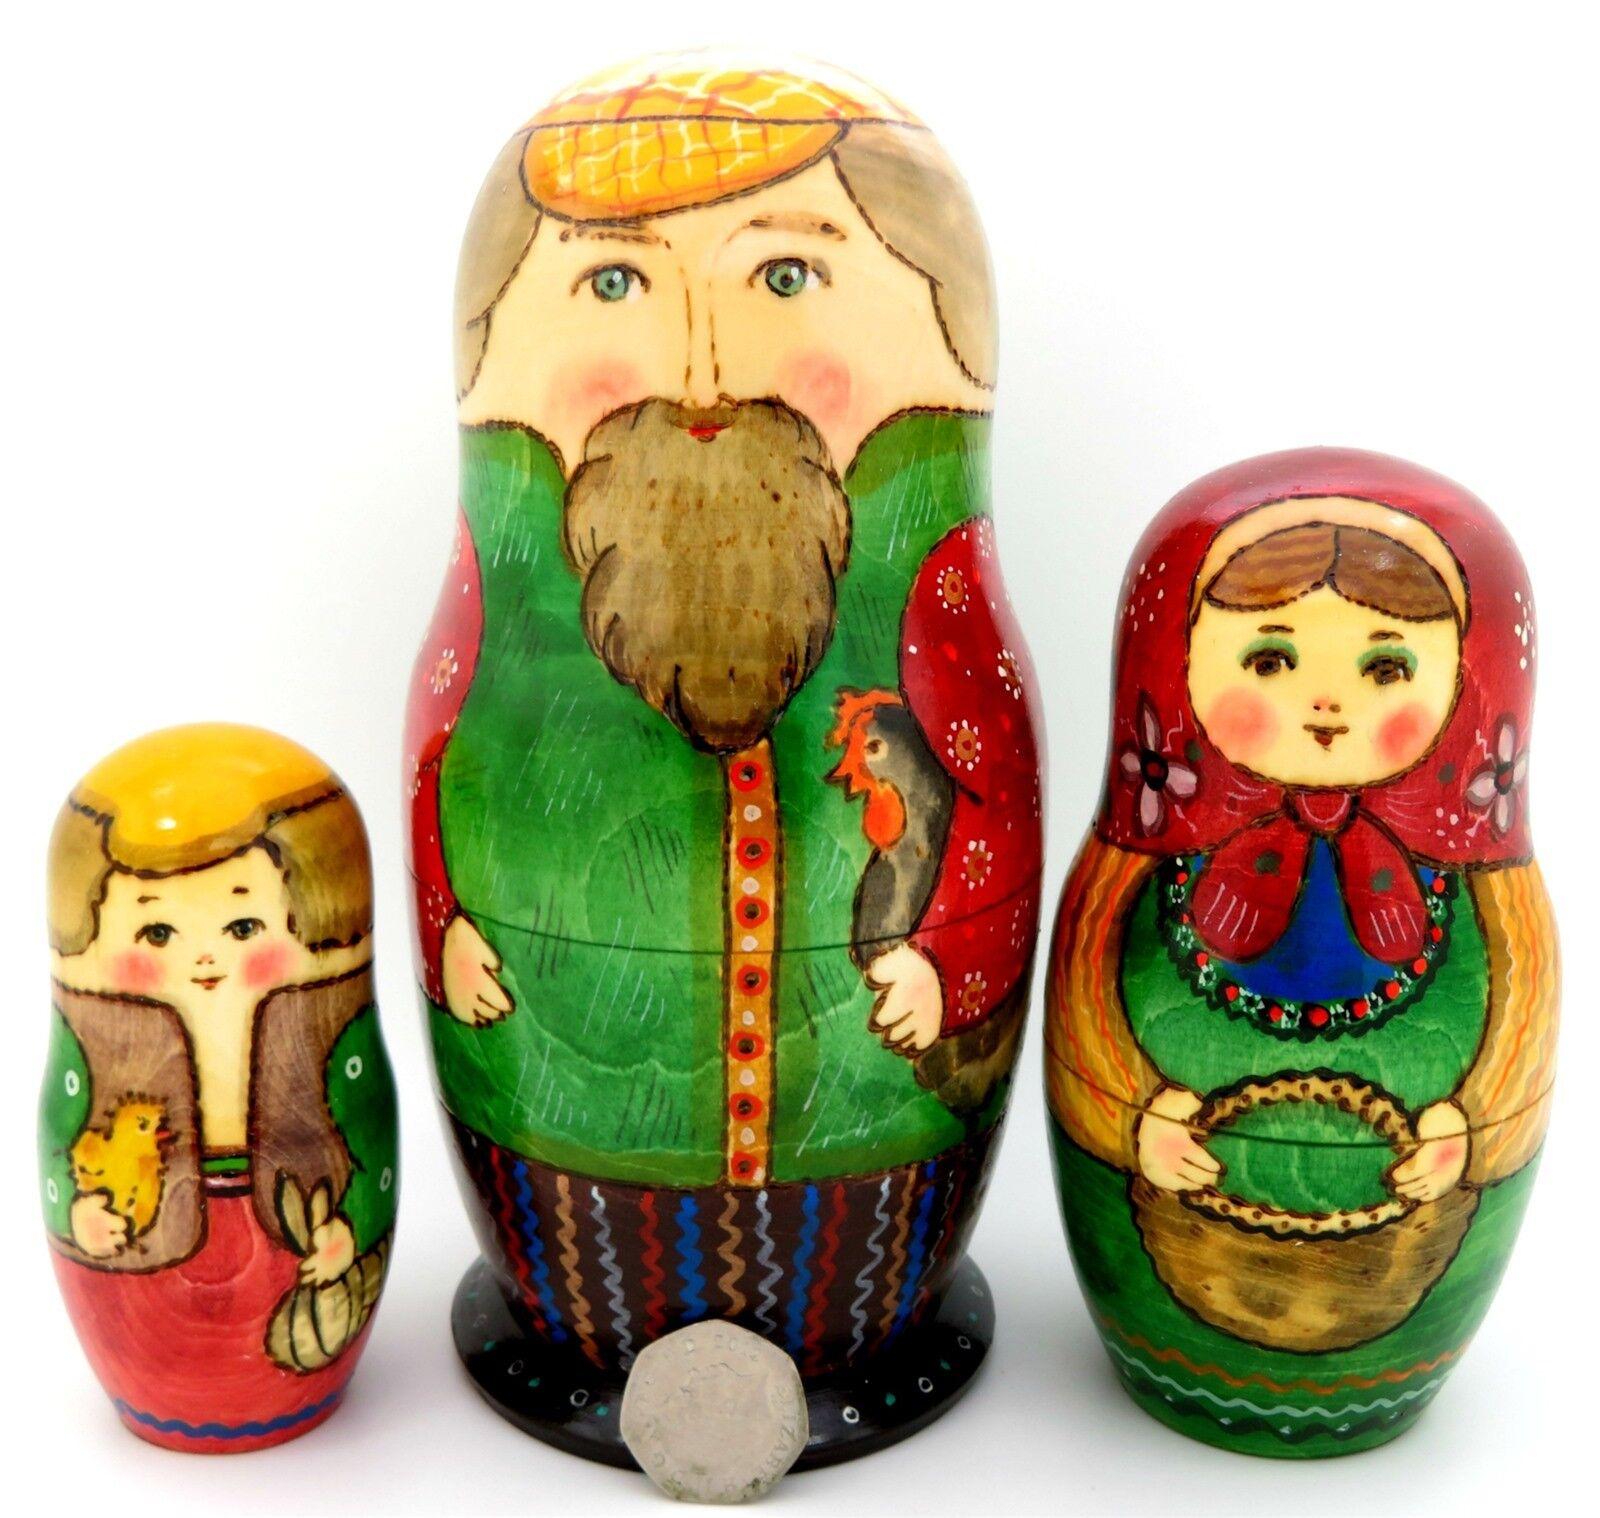 Russian nesting dolls 3 peint à la main traditionnelle Papa & poulet Babushka RYABOVA